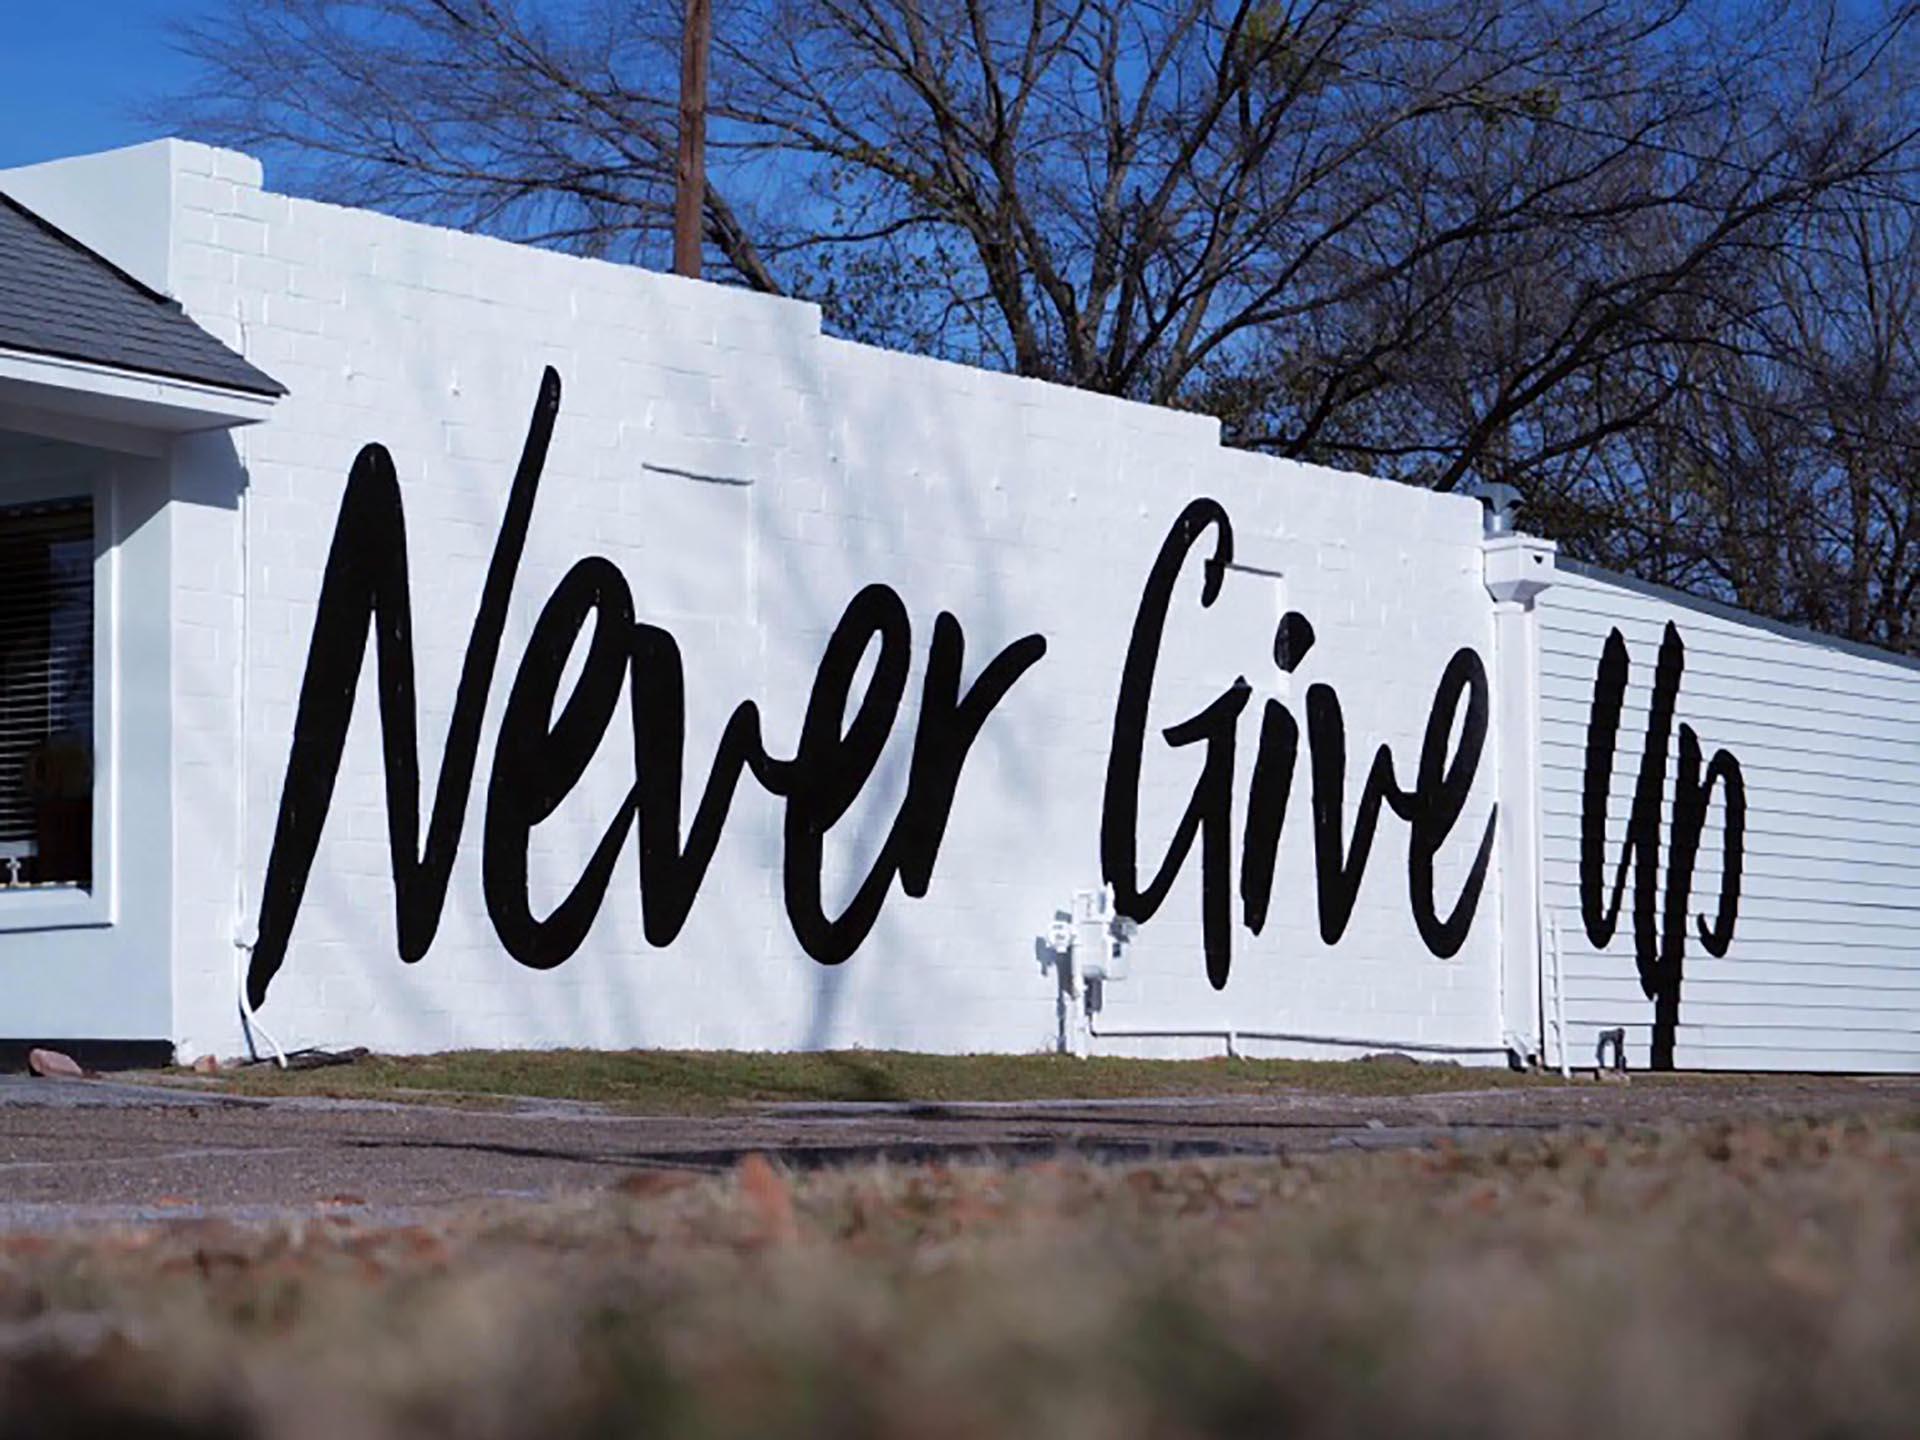 Never Give Up - lettering mural - Dace Kidd - Mural Artist Tx